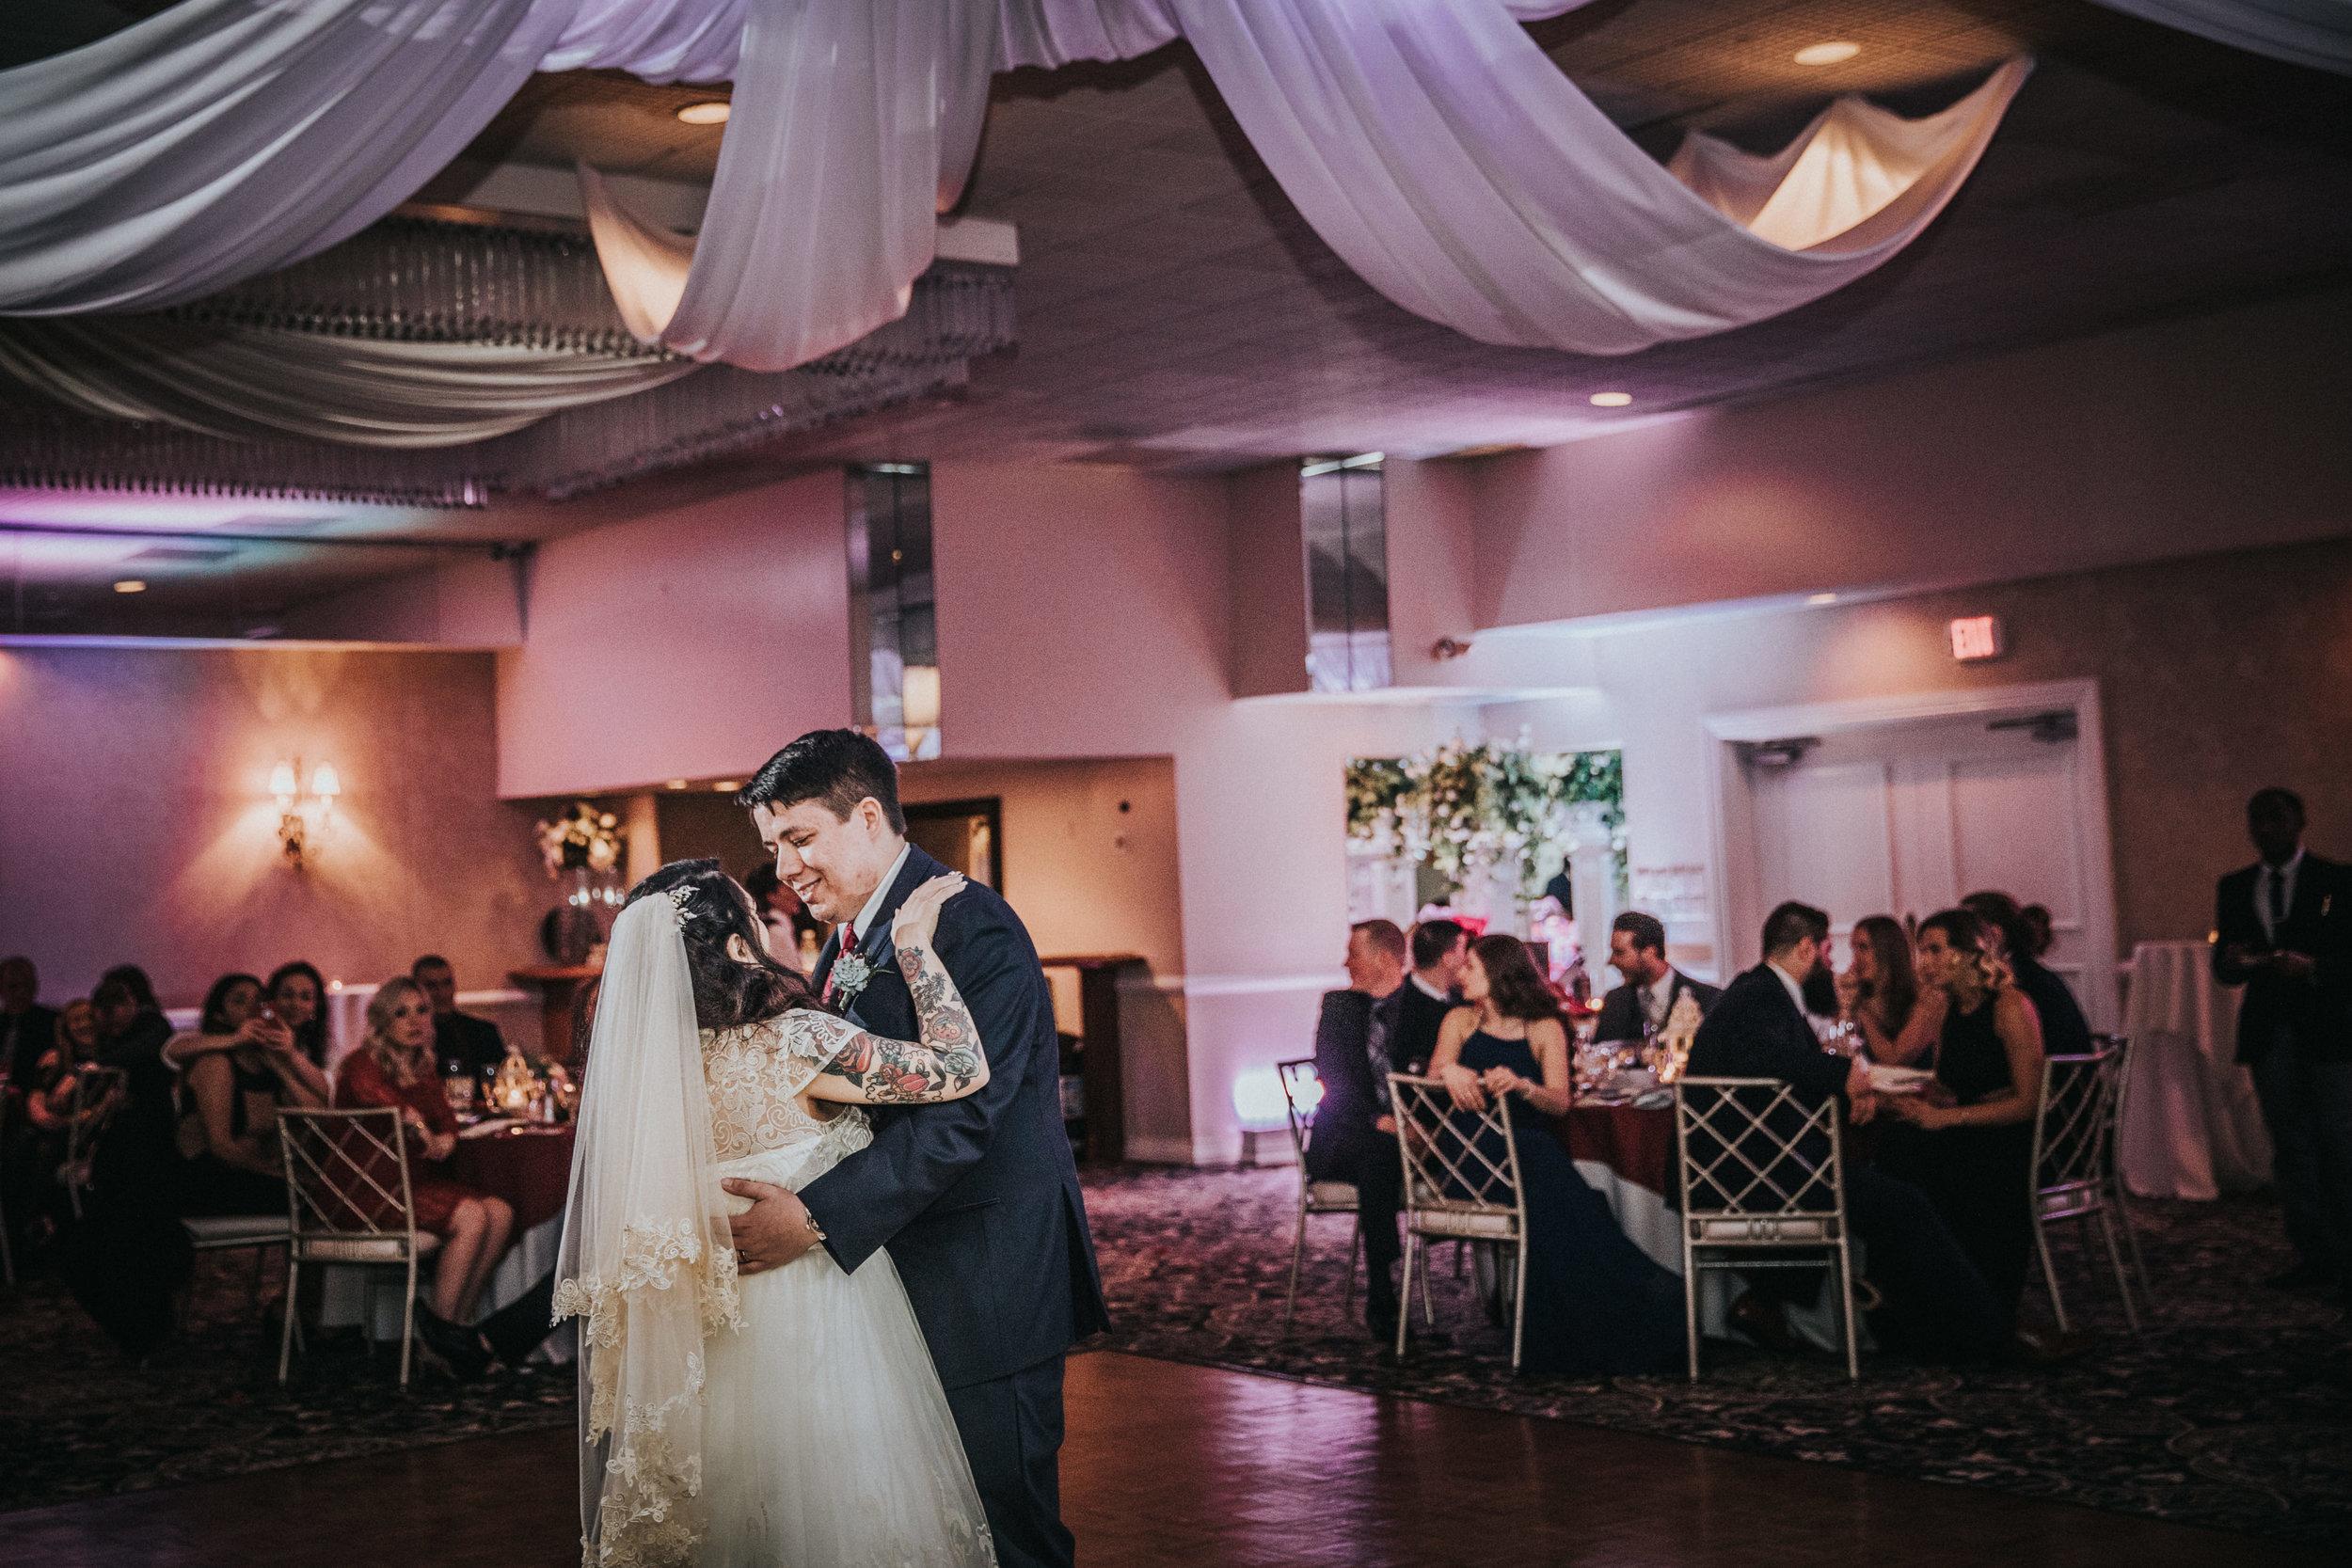 New-Jersey-Wedding-Photographer-ReceptionCenter-Valeria&Mike-Reception (74 of 265).jpg